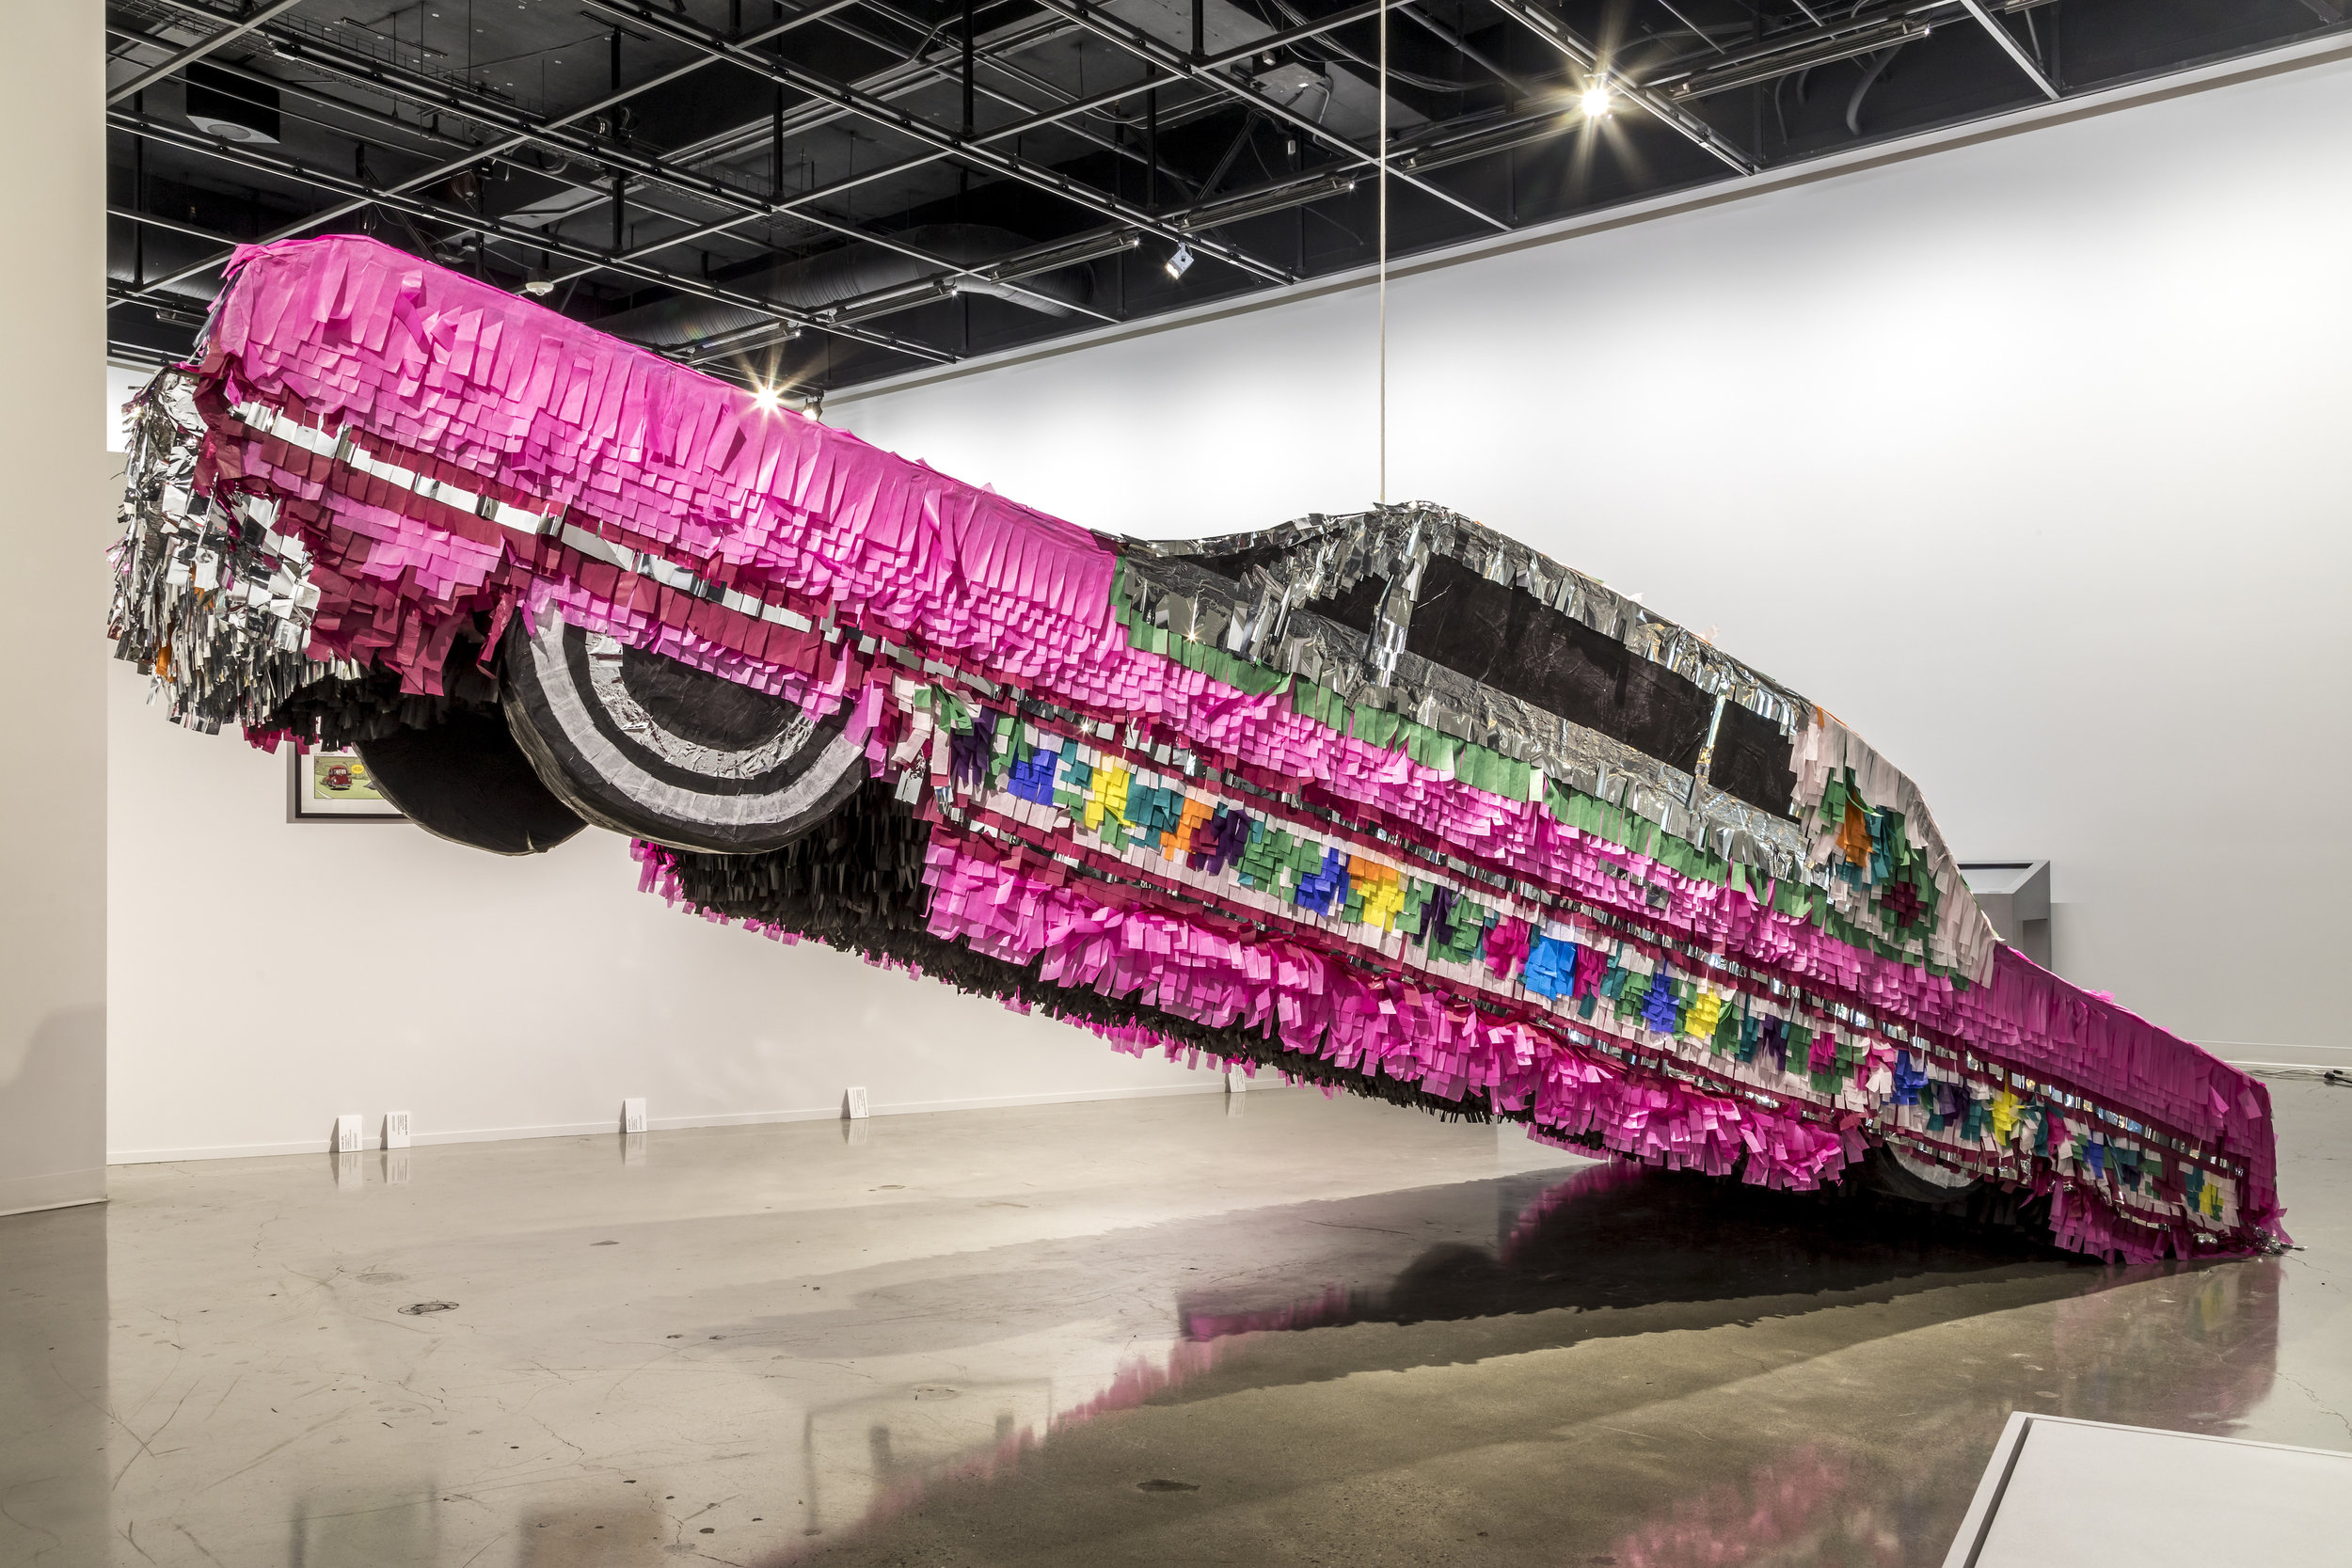 Gypsy Rose Piñata. 2017. Found objects, cardboard, styrofoam, paper and glue.5'x19.5'x6.5'  Photo: Courtesy Petersen Automotive Museum